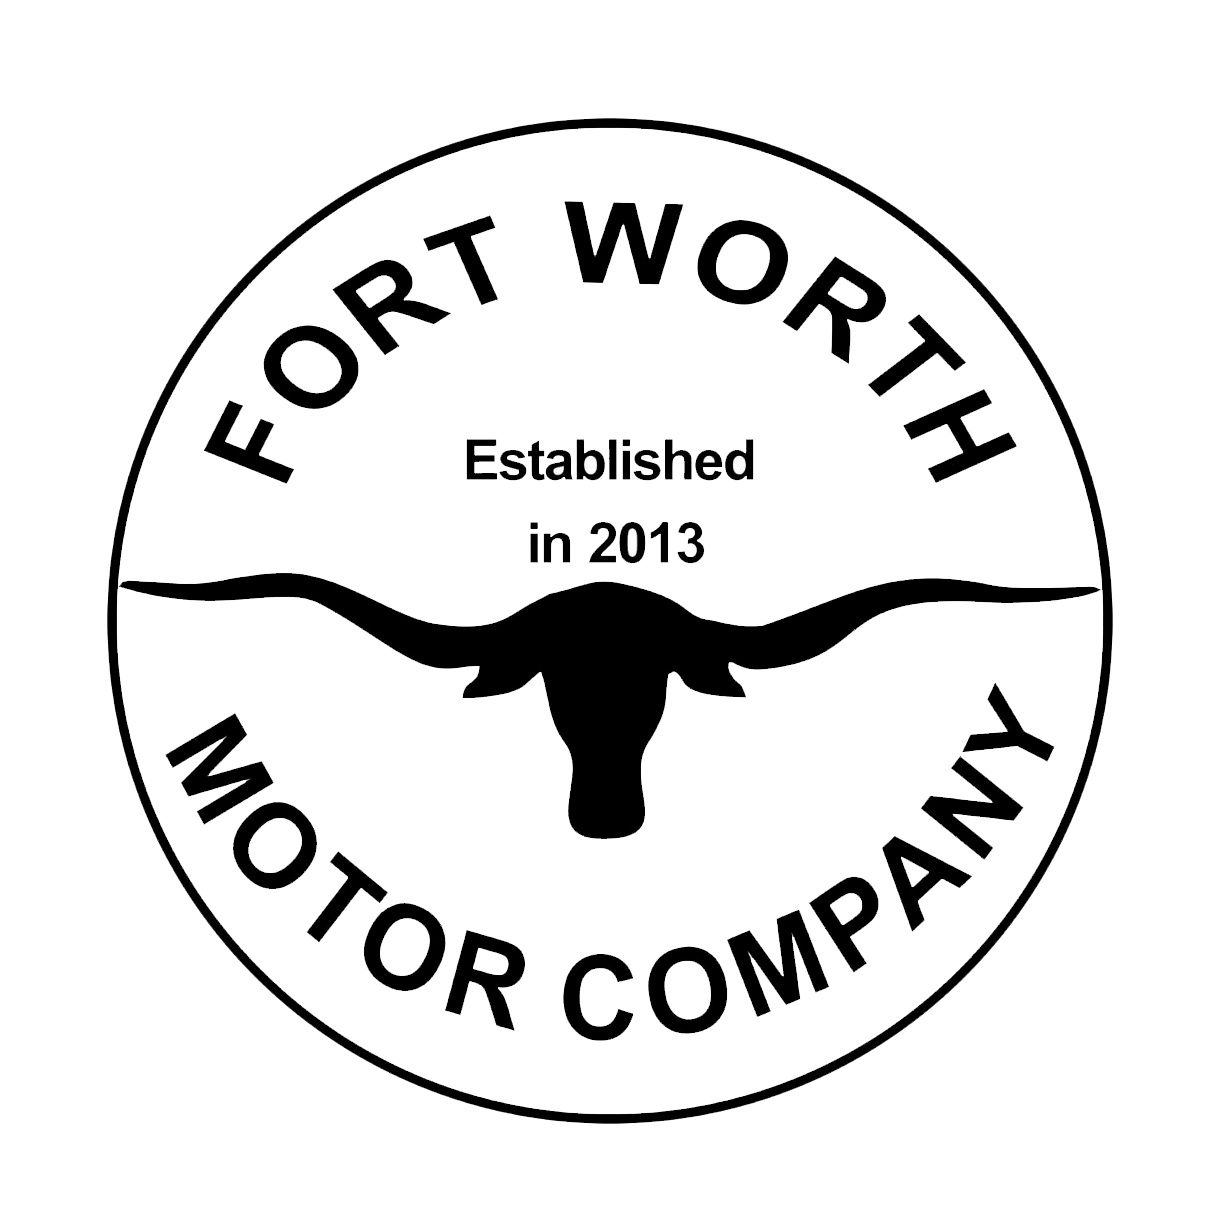 Fort Worth Motor Company